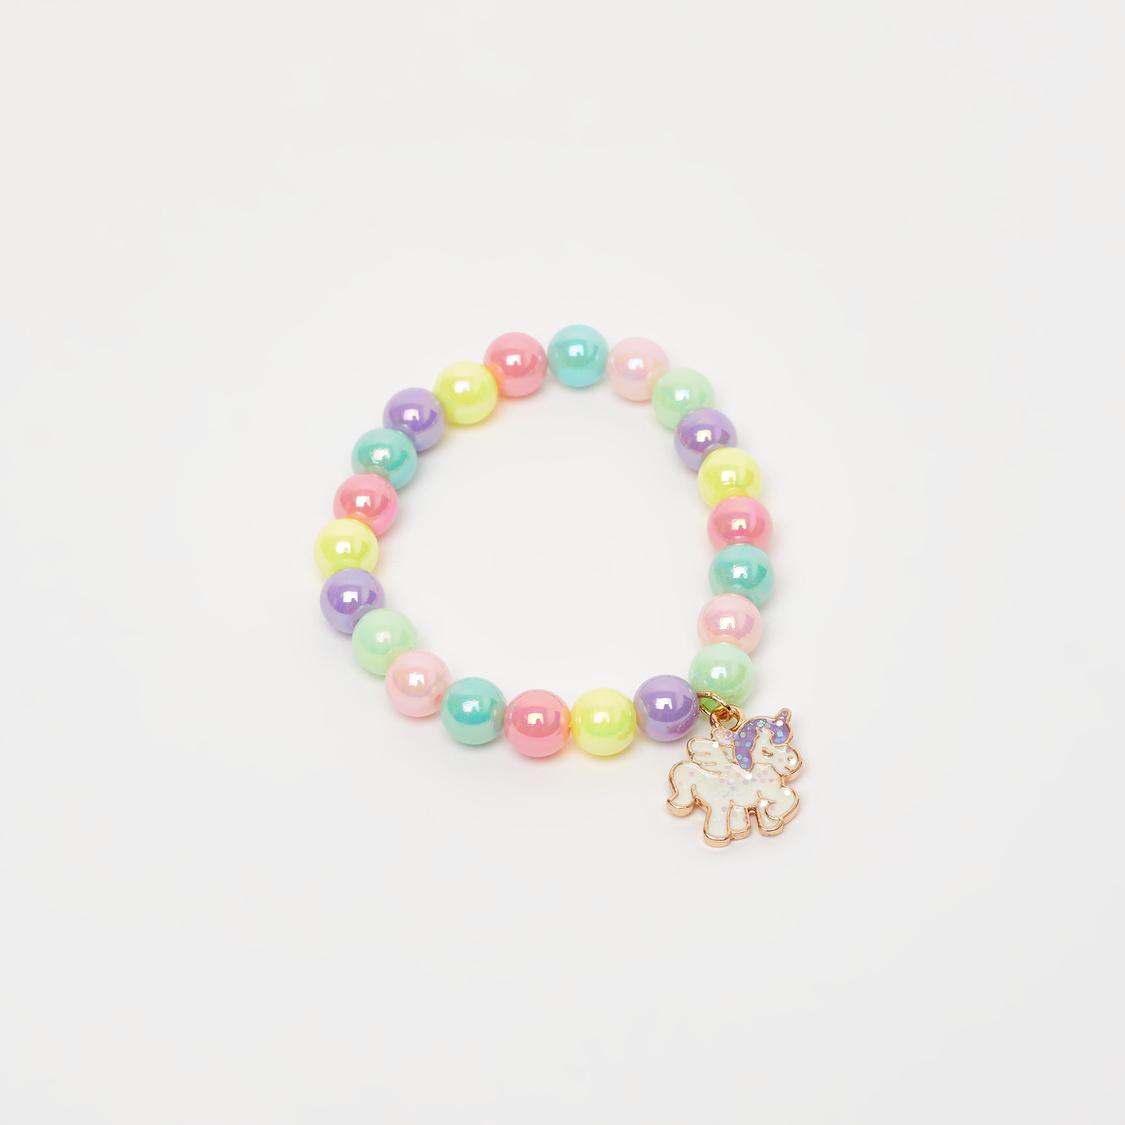 Beaded Necklace and Bracelet Set with Unicorn Pendants